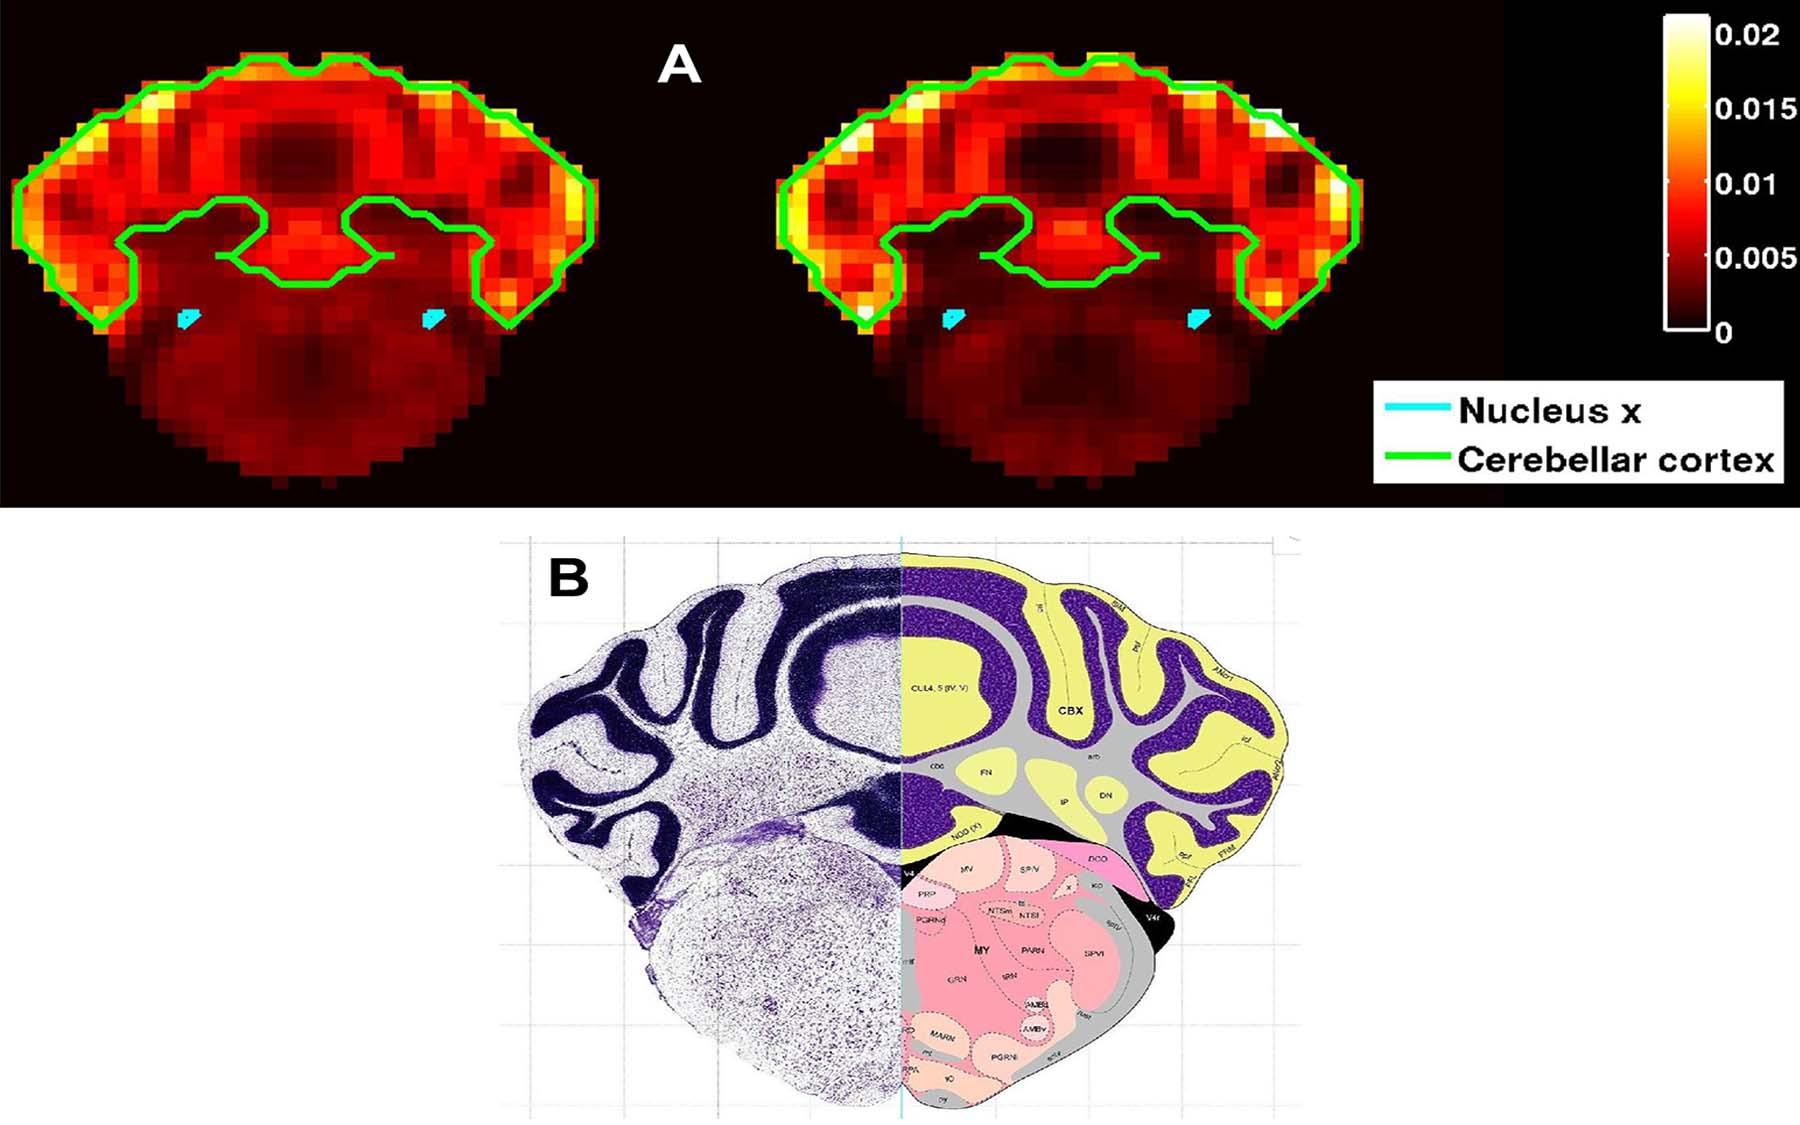 Nucleus X Cerebellar cortex